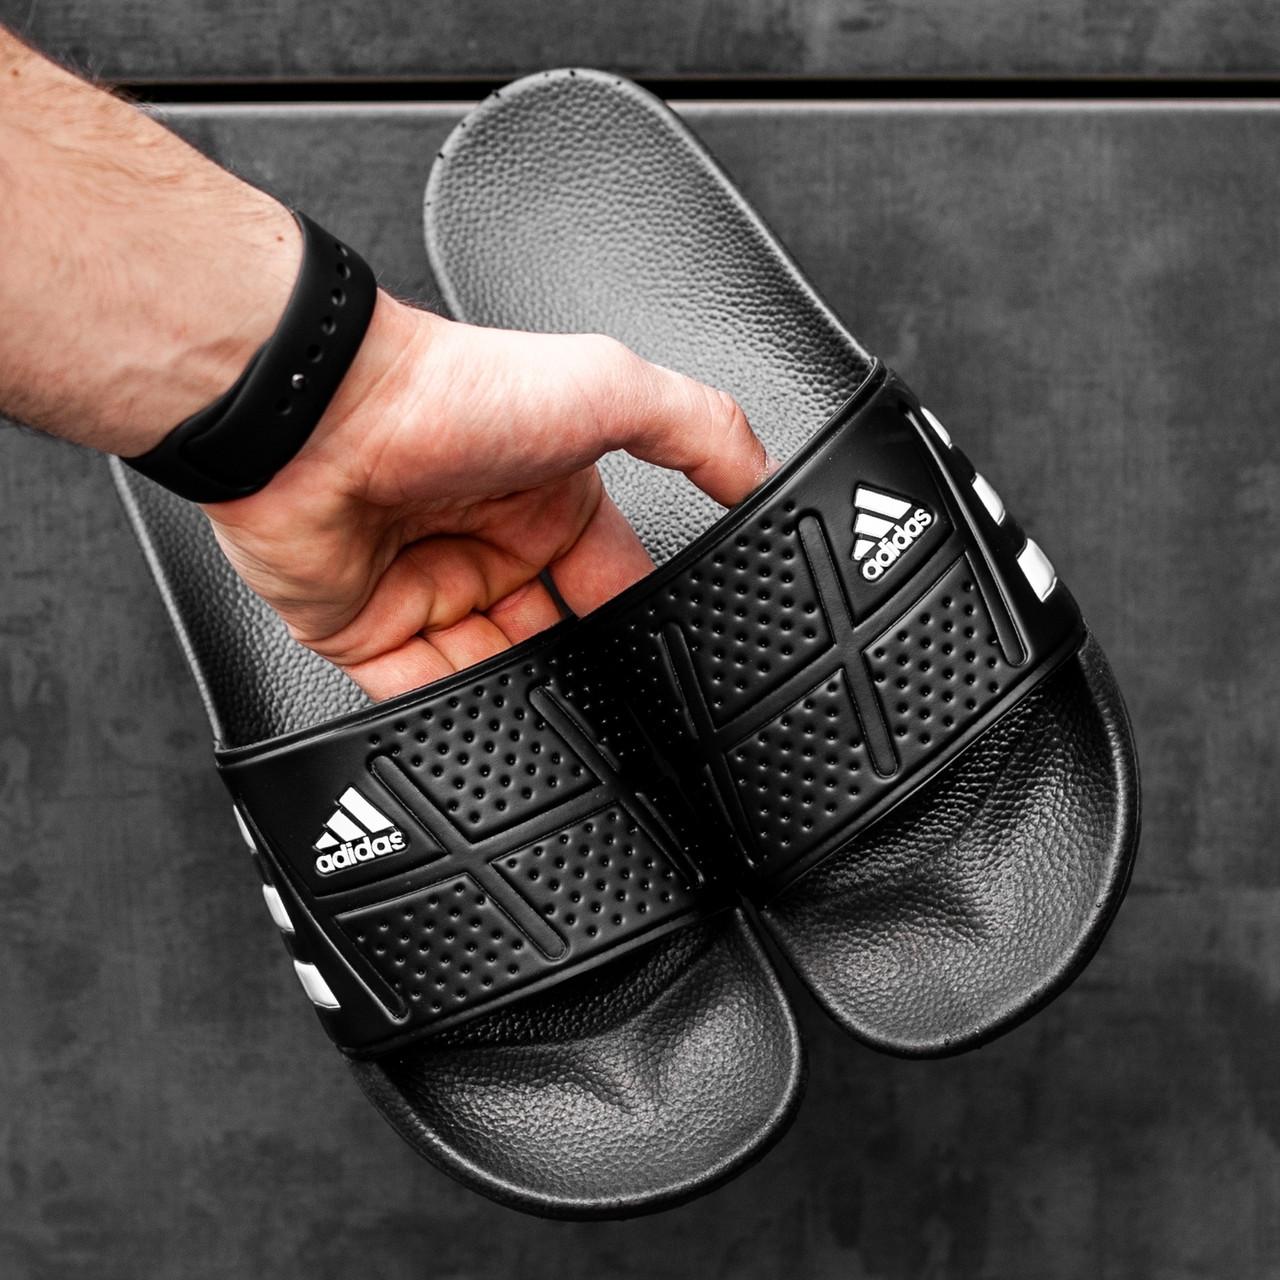 Мужские сланцы в стиле Adidas (full black), сланцы Адидас, шлепанцы Адидас (Реплика ААА)